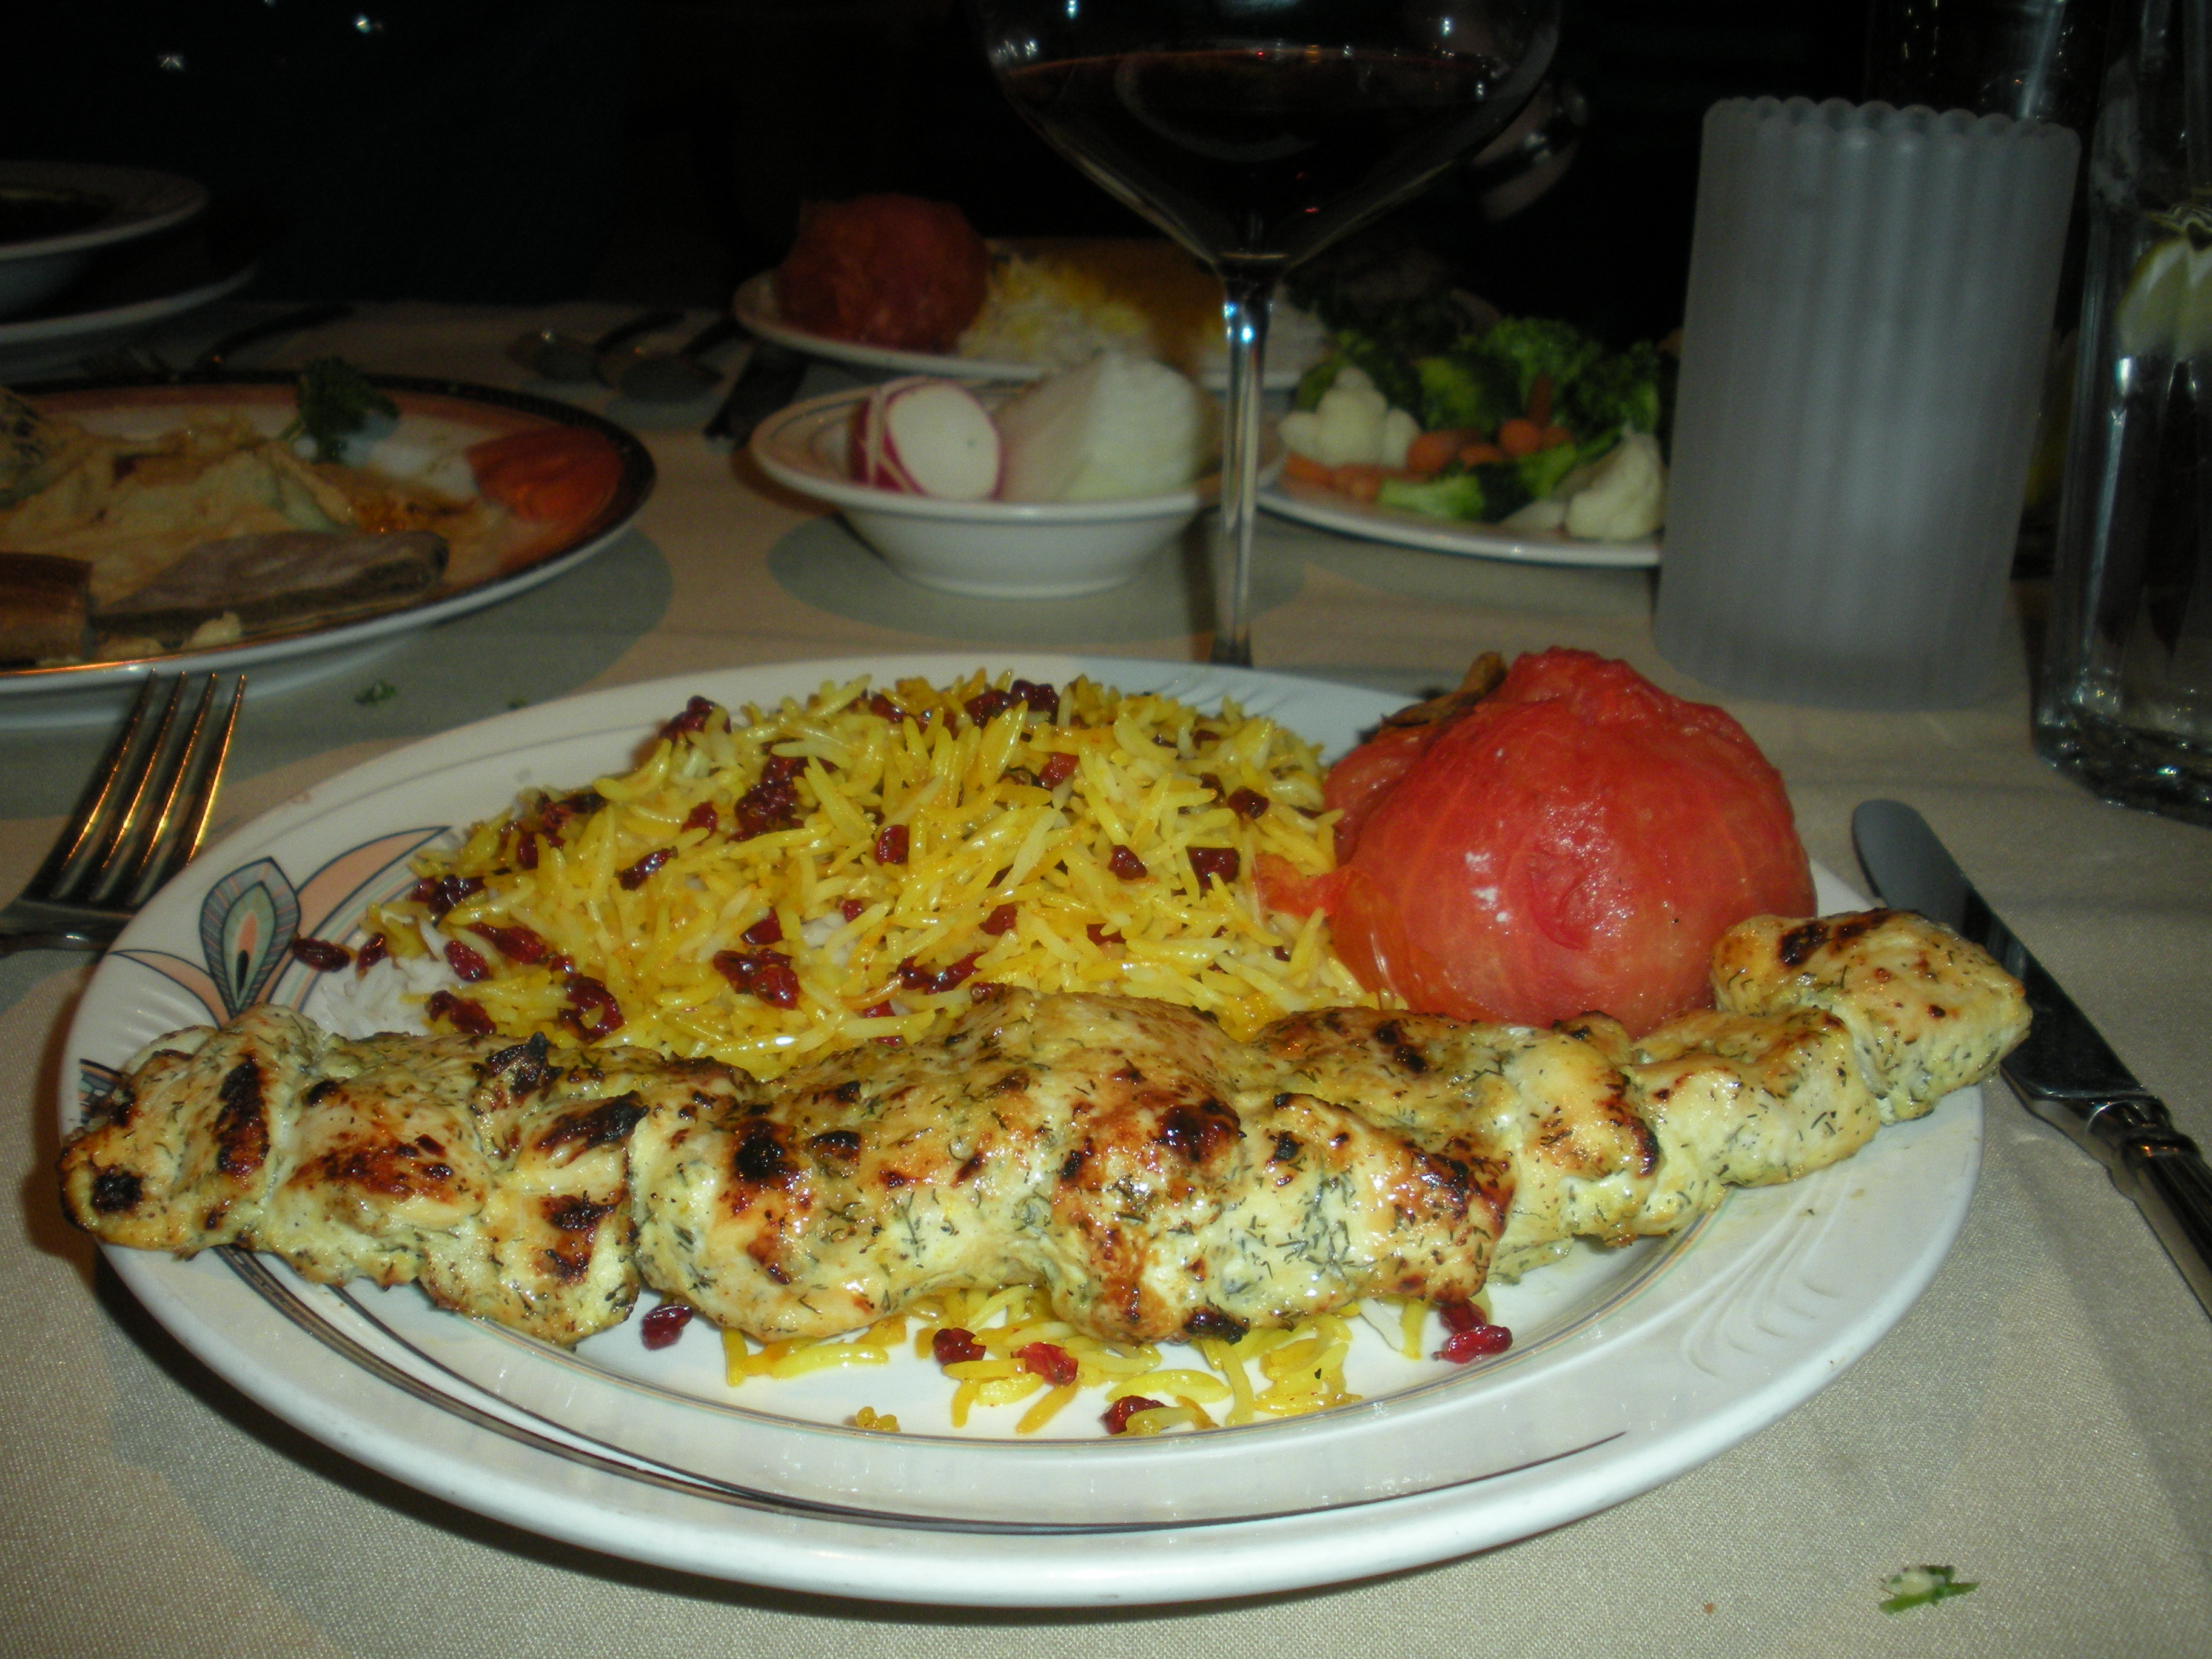 Lipstick jihad habib s persian cuisine becky a johnson for Ahmads persian cuisine